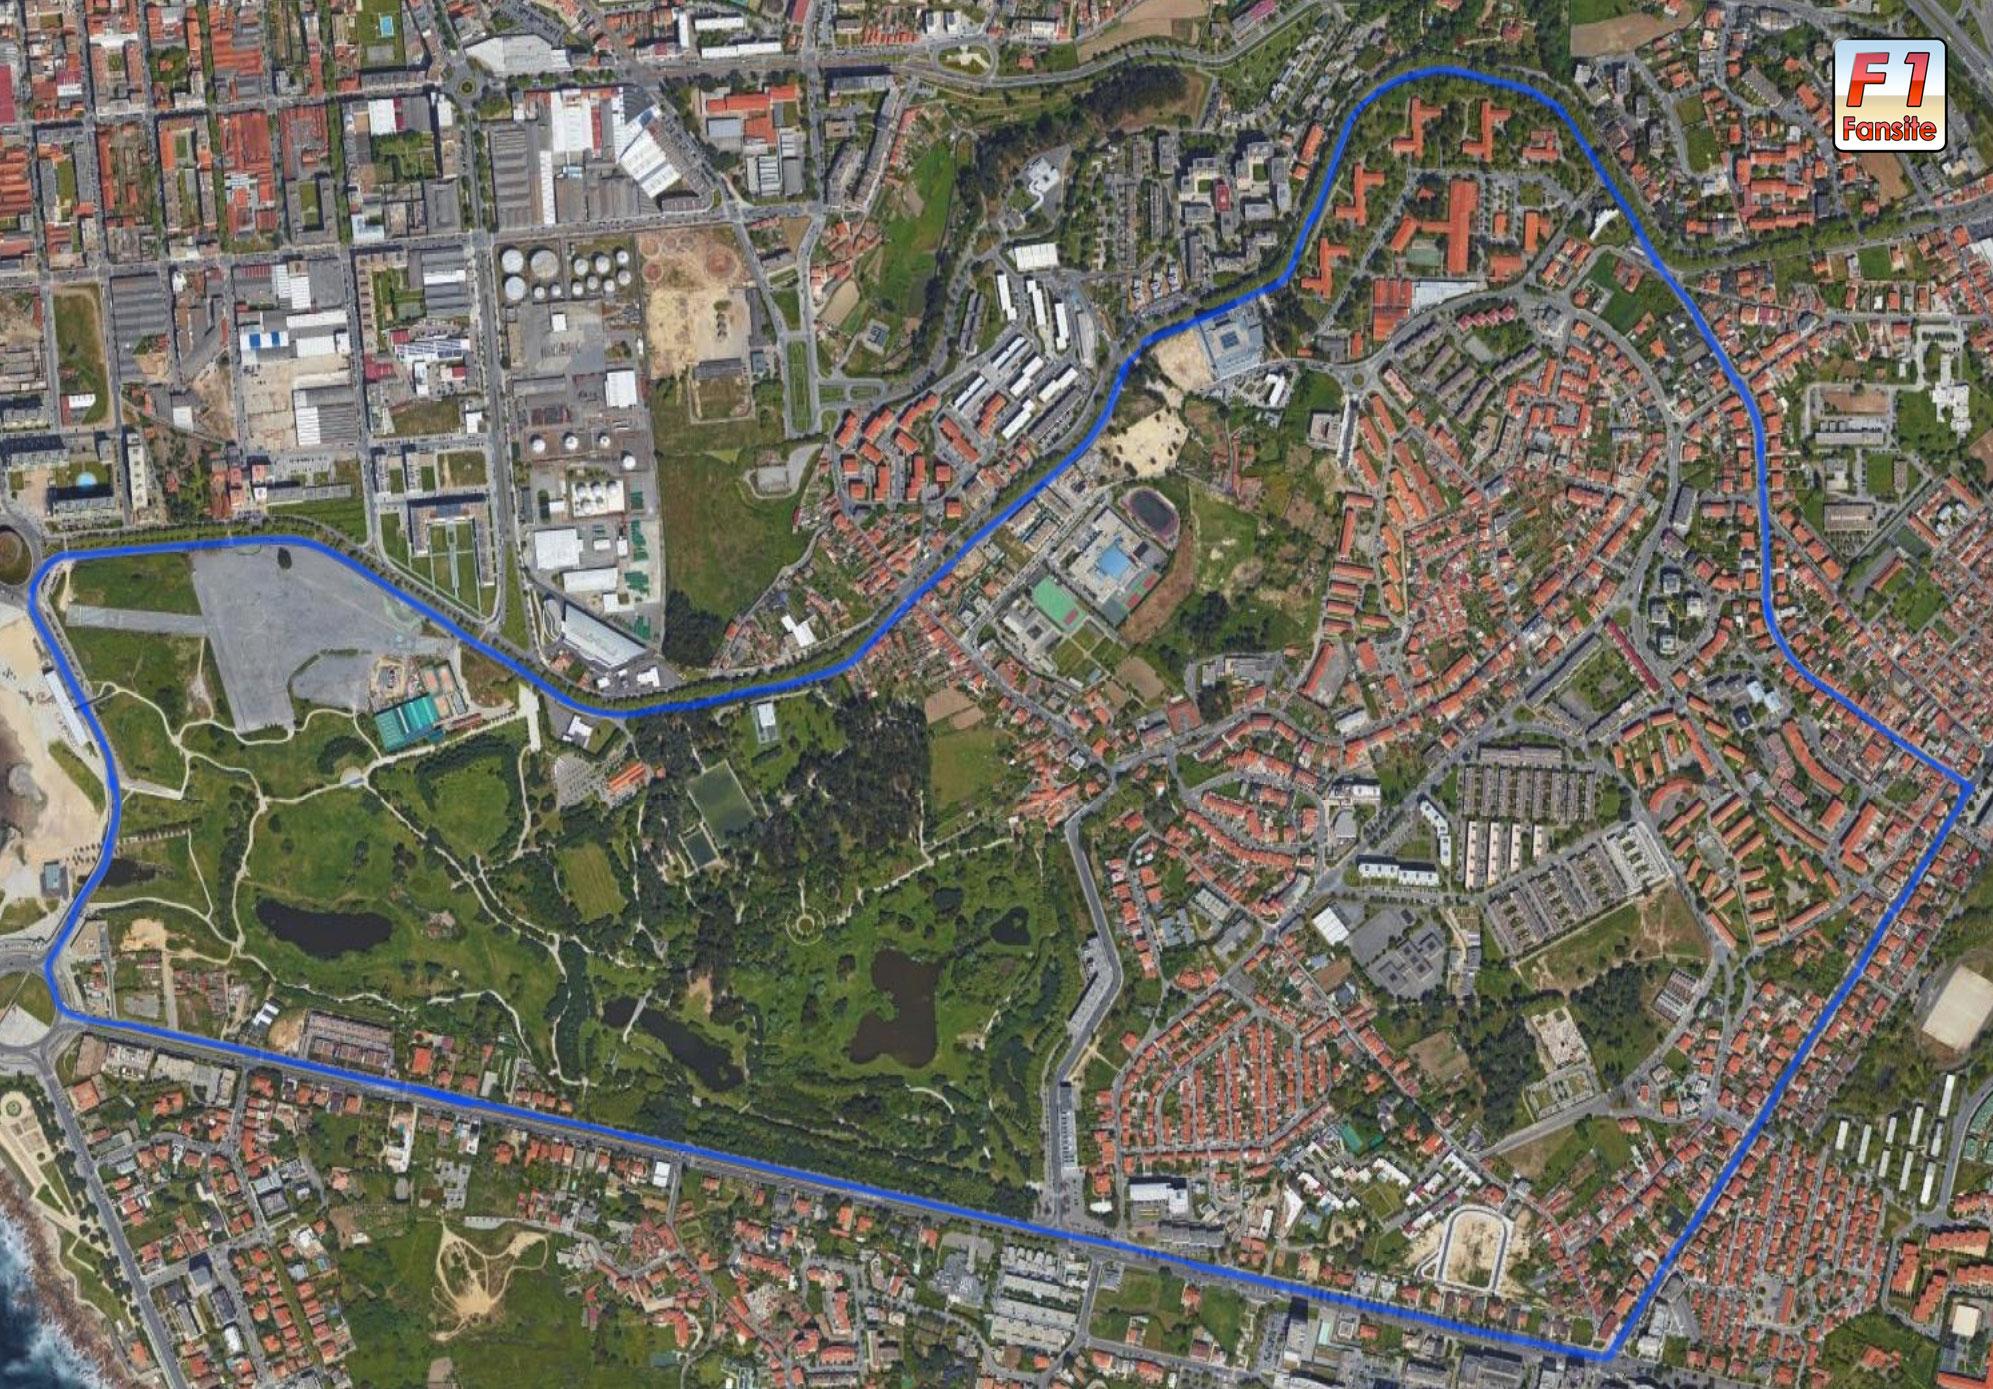 Circuito da Boavista layout